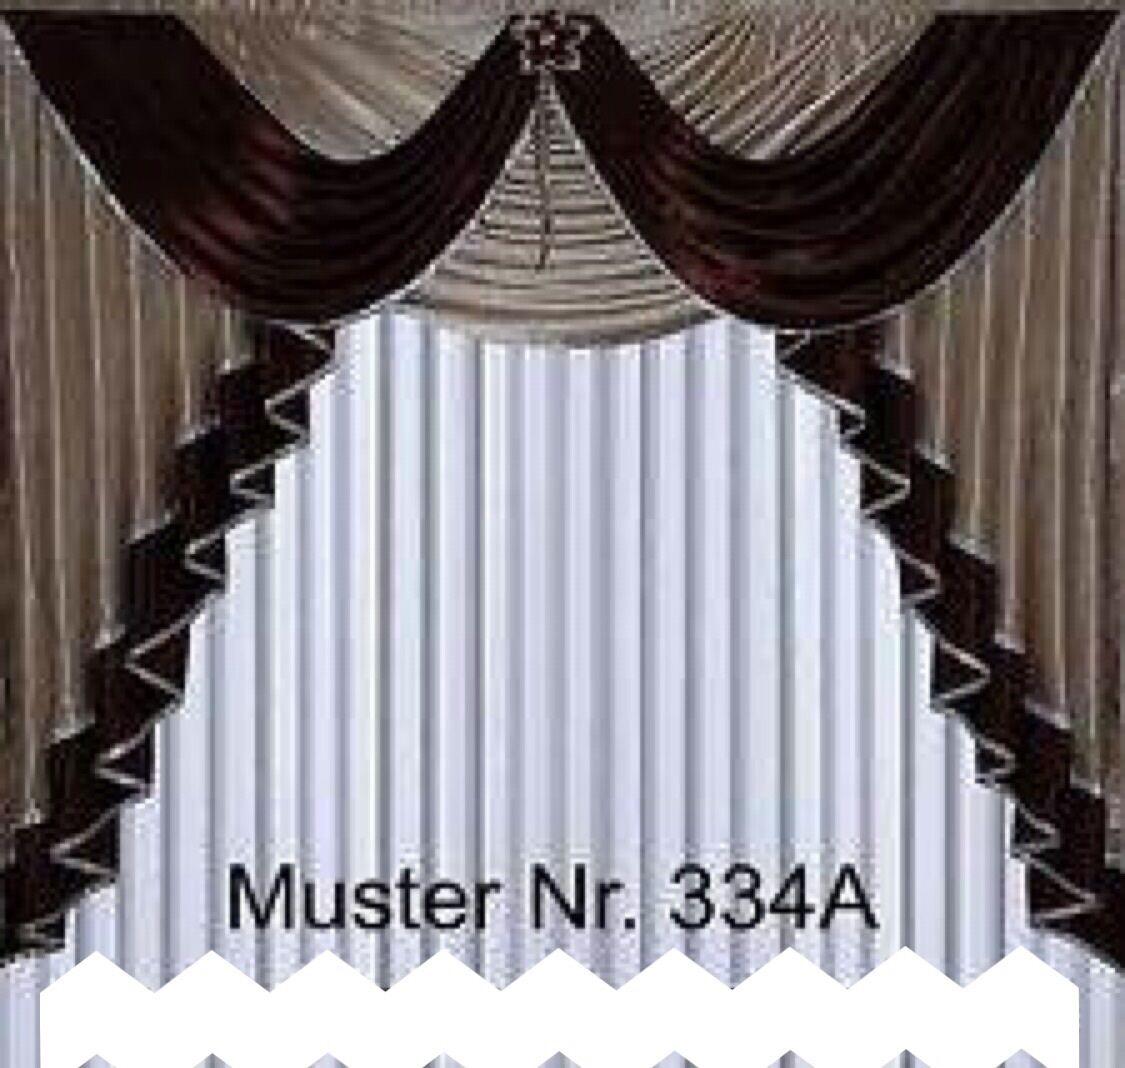 Rollos Gardinen Vorh Nge deko gardinen gardine vorhänge übergardinen nr 335 eur 149 00 picclick be